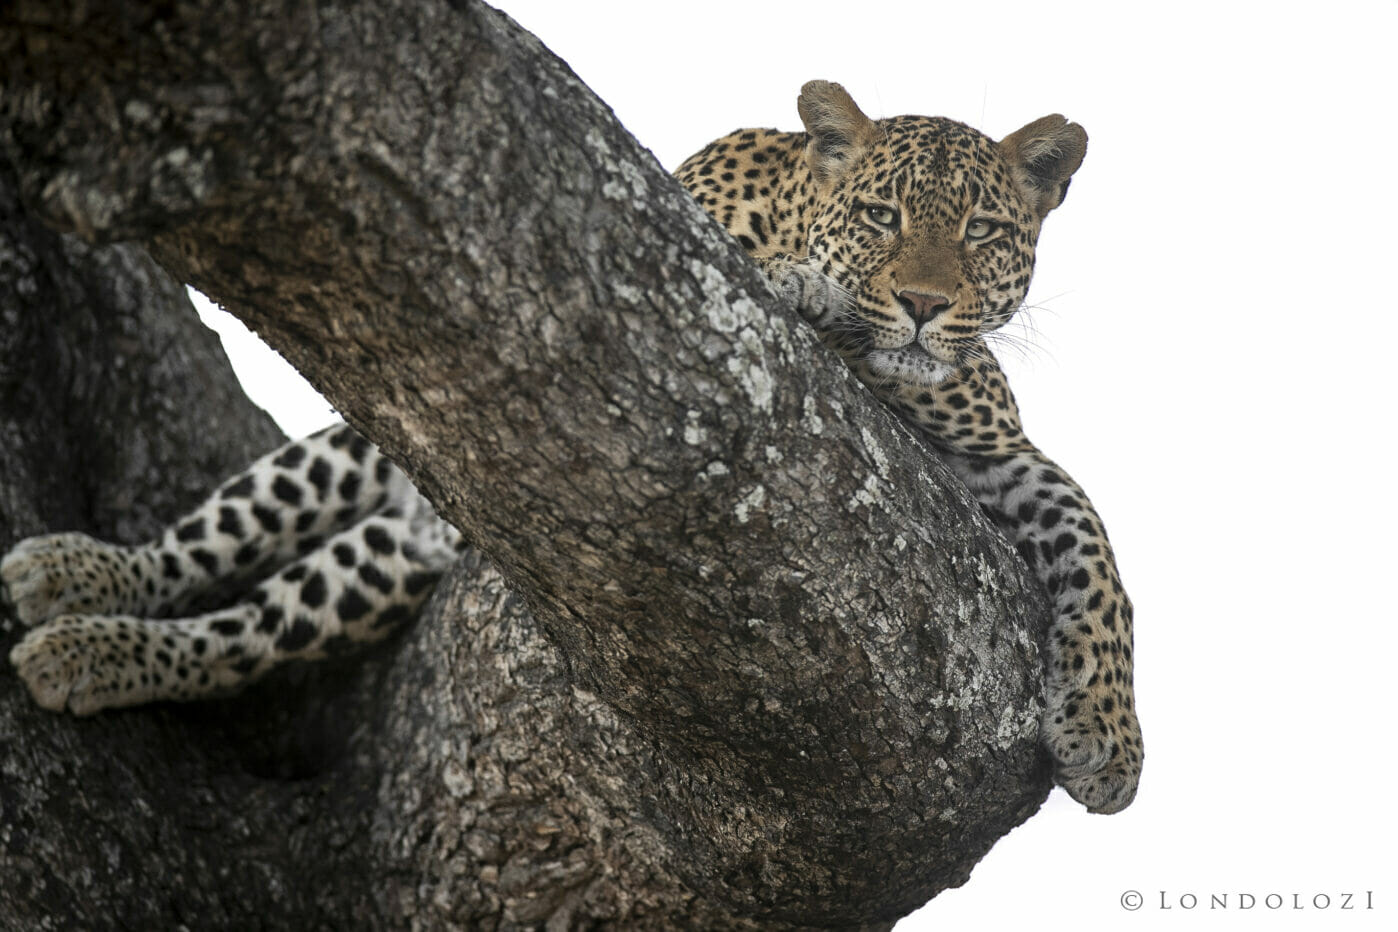 SDZ Picadilly Female leopard in Jackalberry resting